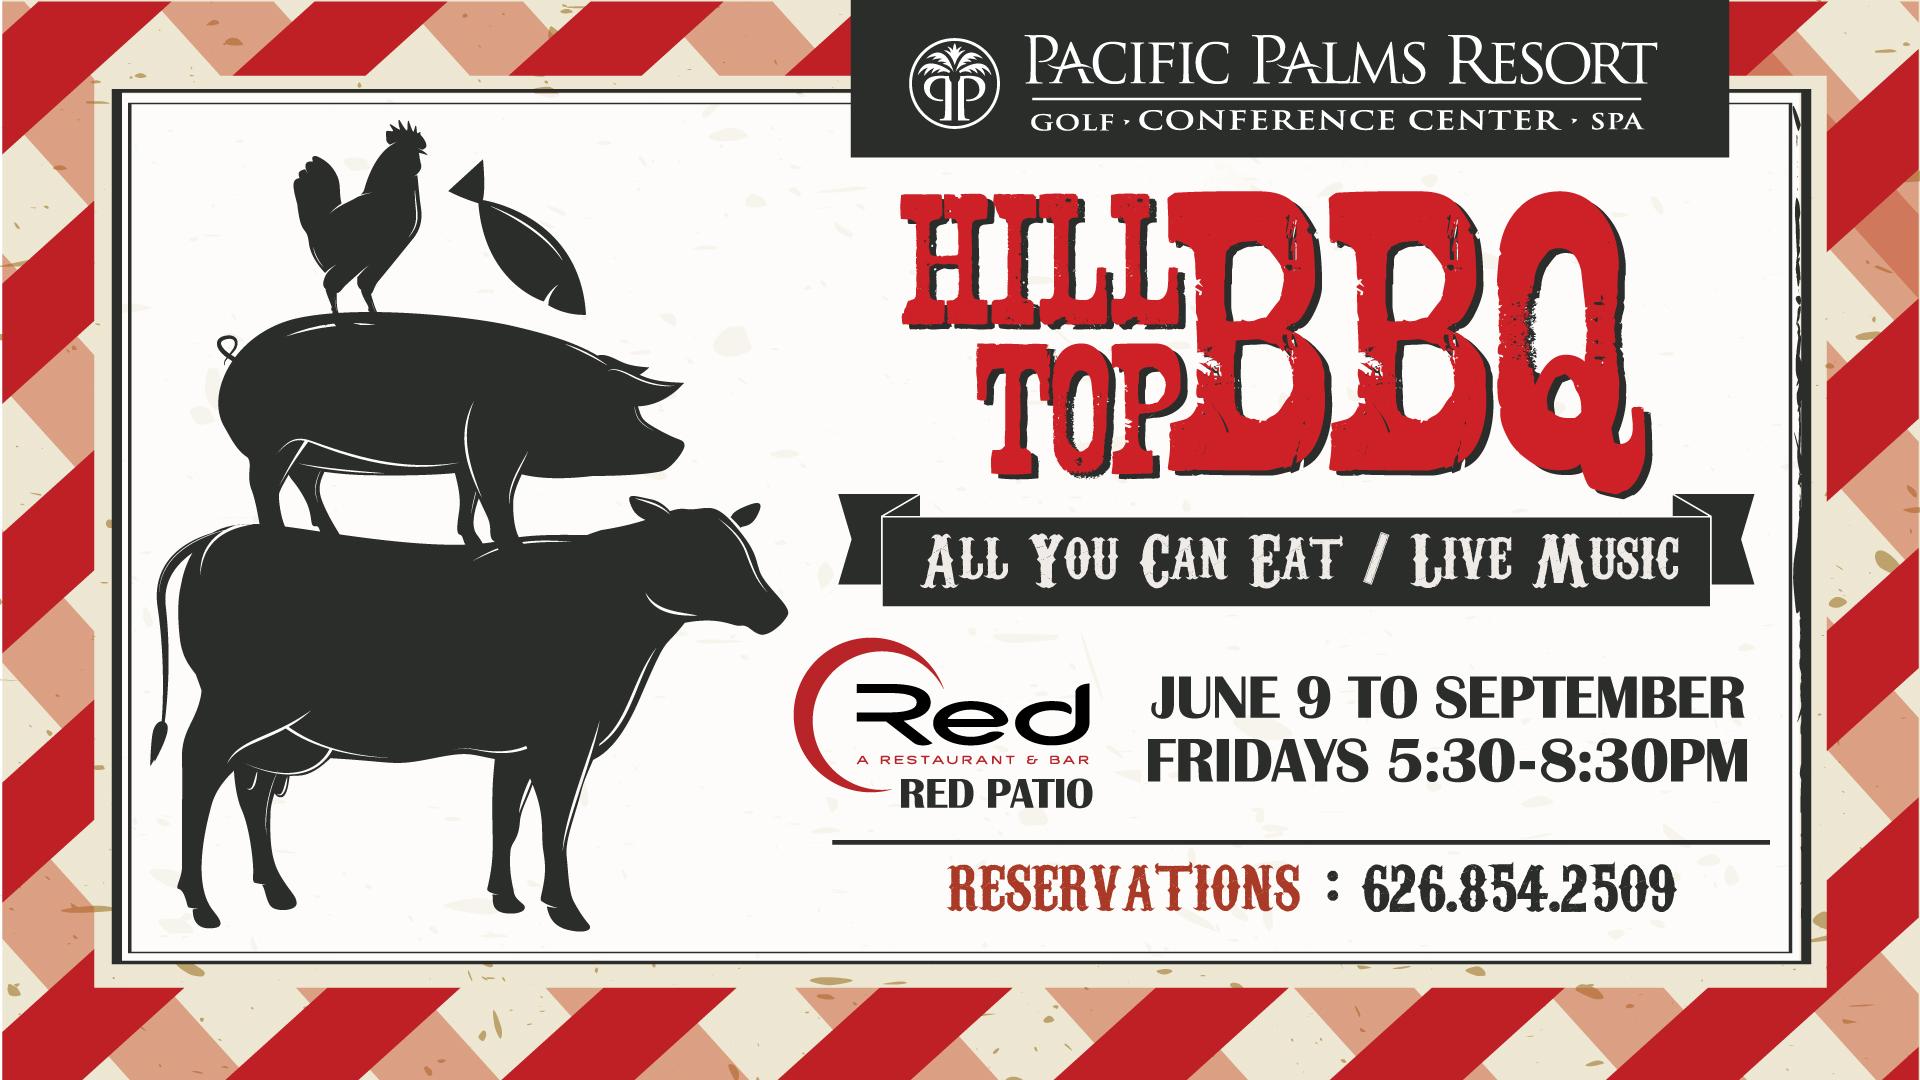 PPR-Hilltop-BBQ-1920x1080-.jpg